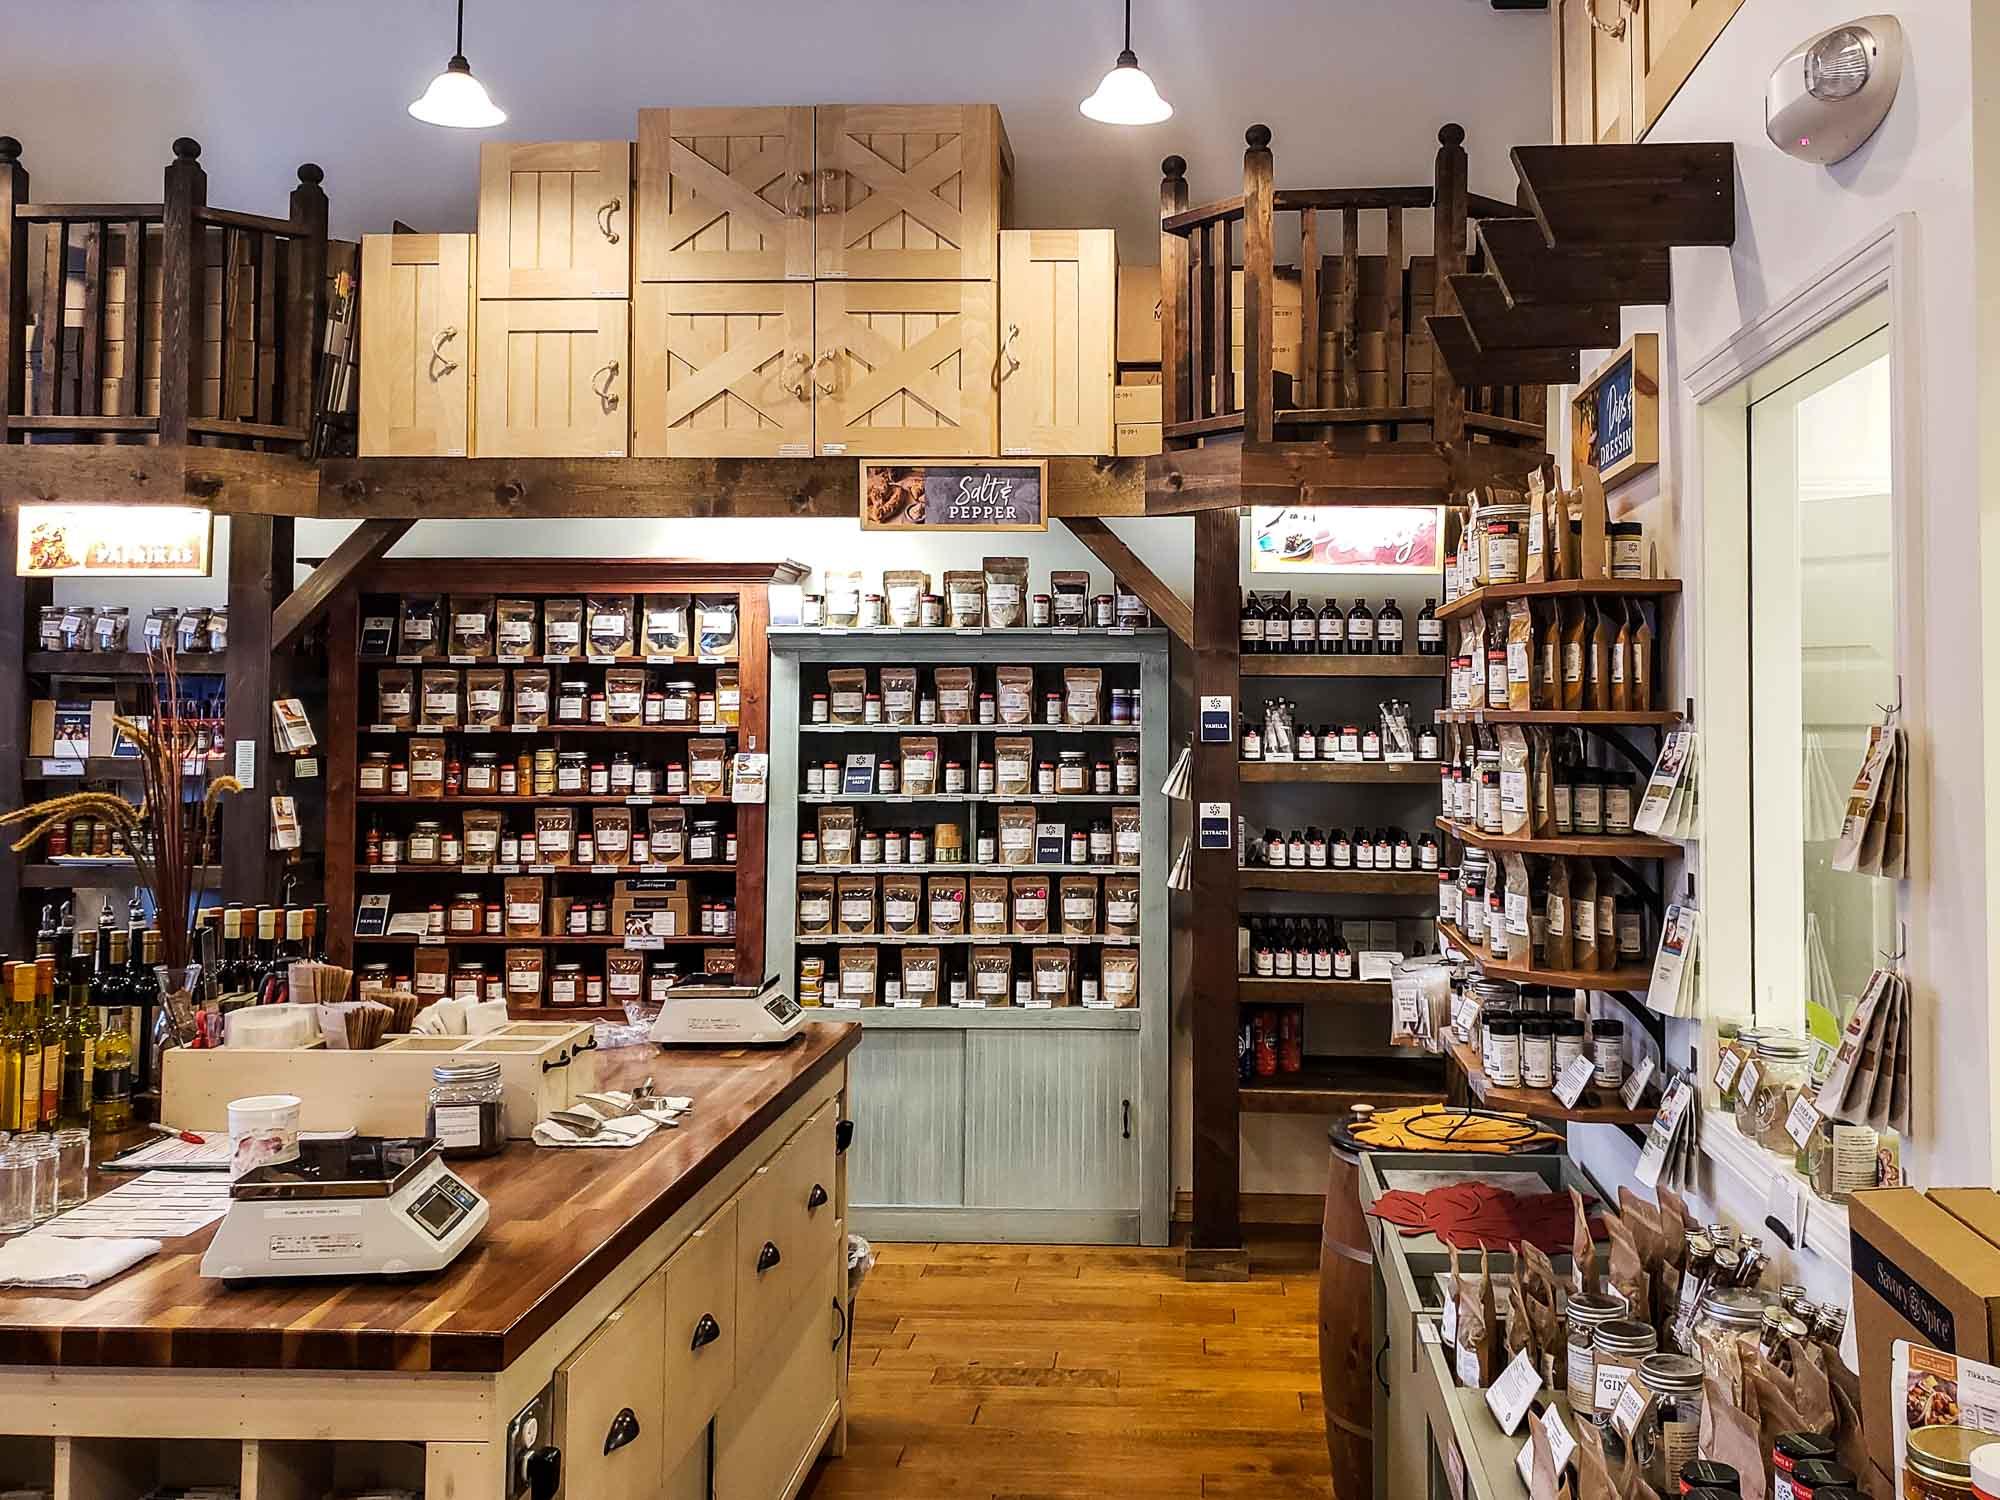 visit-sellwood-moreland-business-alliance_savory-spice-shop-sellwood-4.jpg